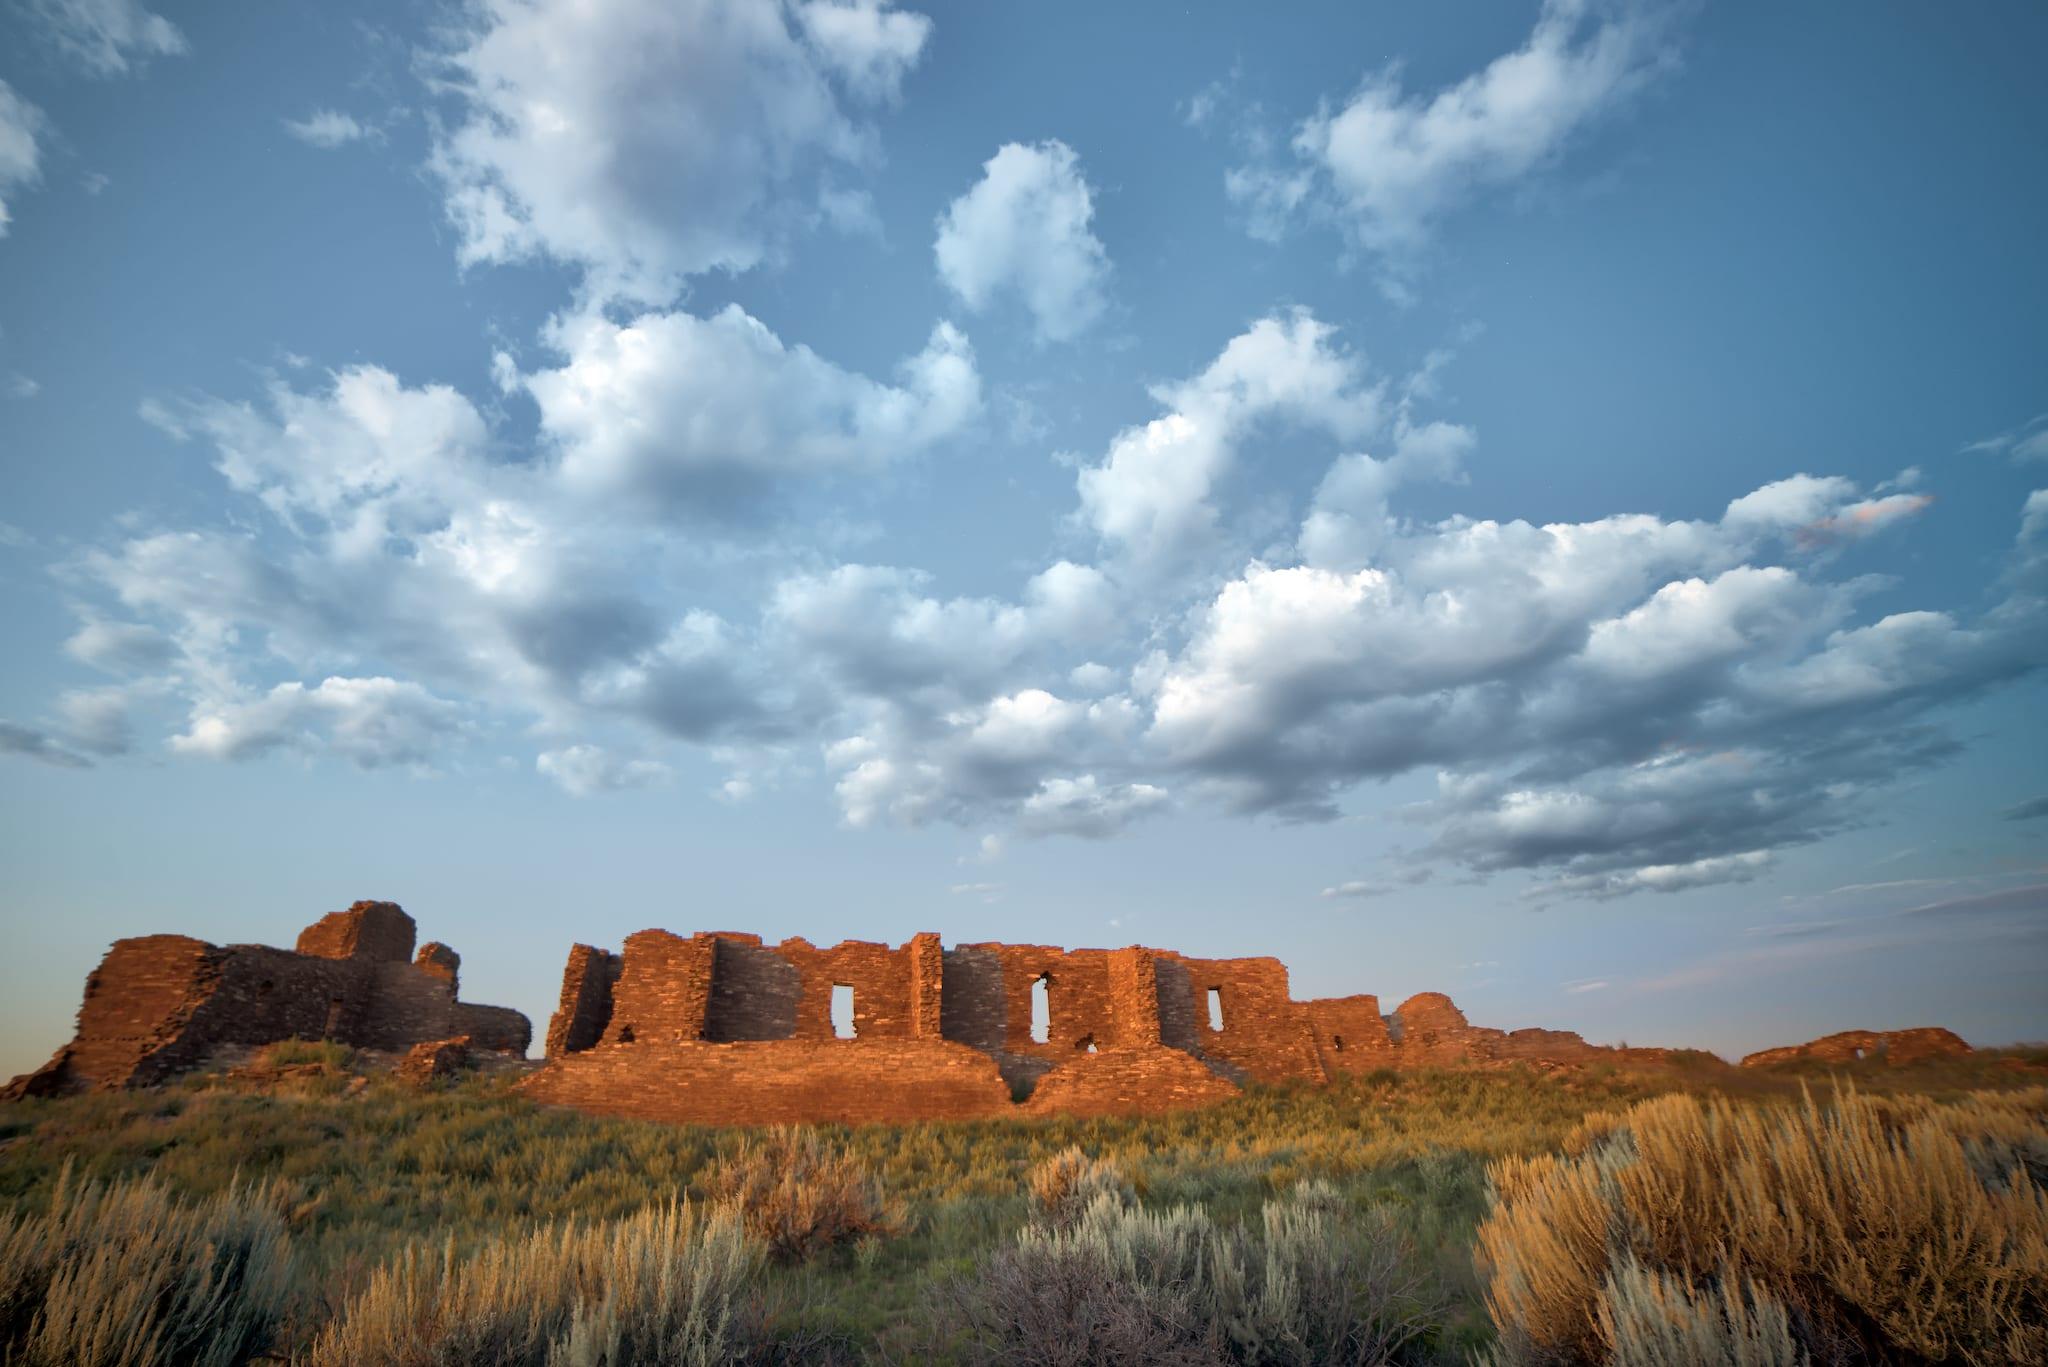 Pueblo Pintado Ruin Chaco Culture National Historic Park Sunset New Mexico